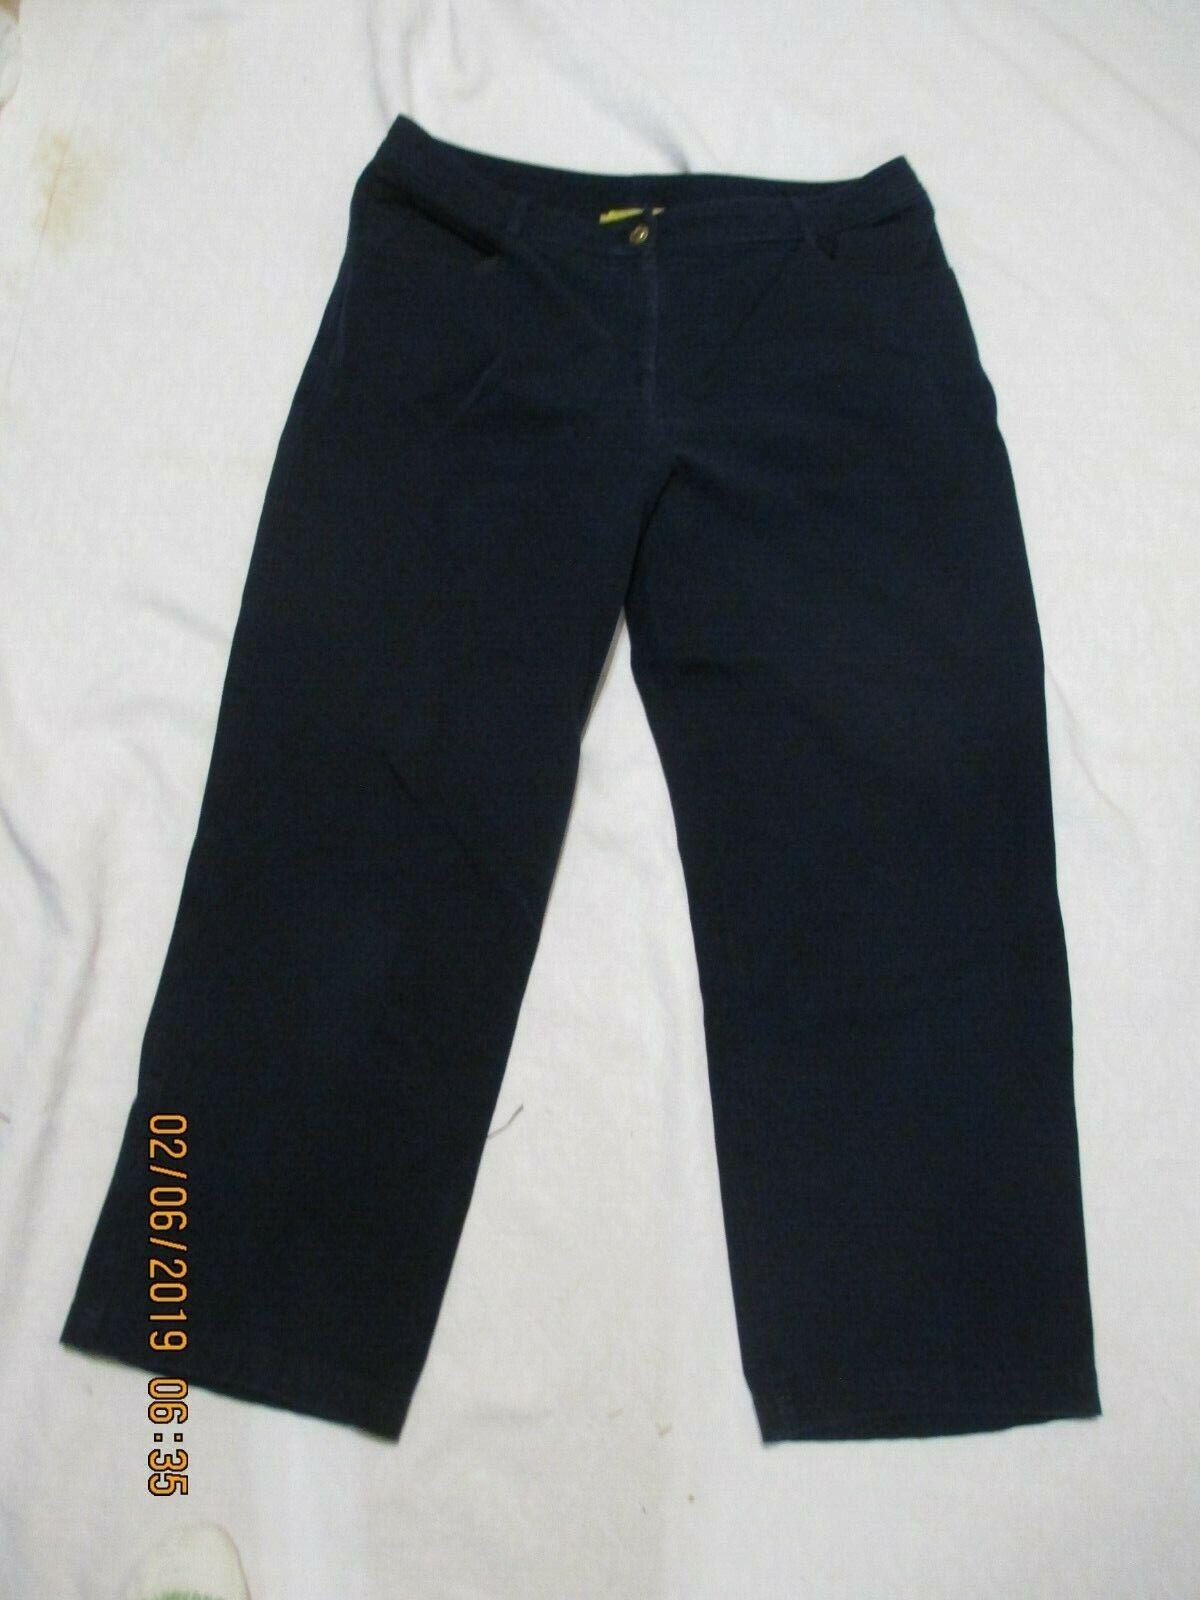 ST. JOHN cropped capri pants size 12 navy bluee stretchy